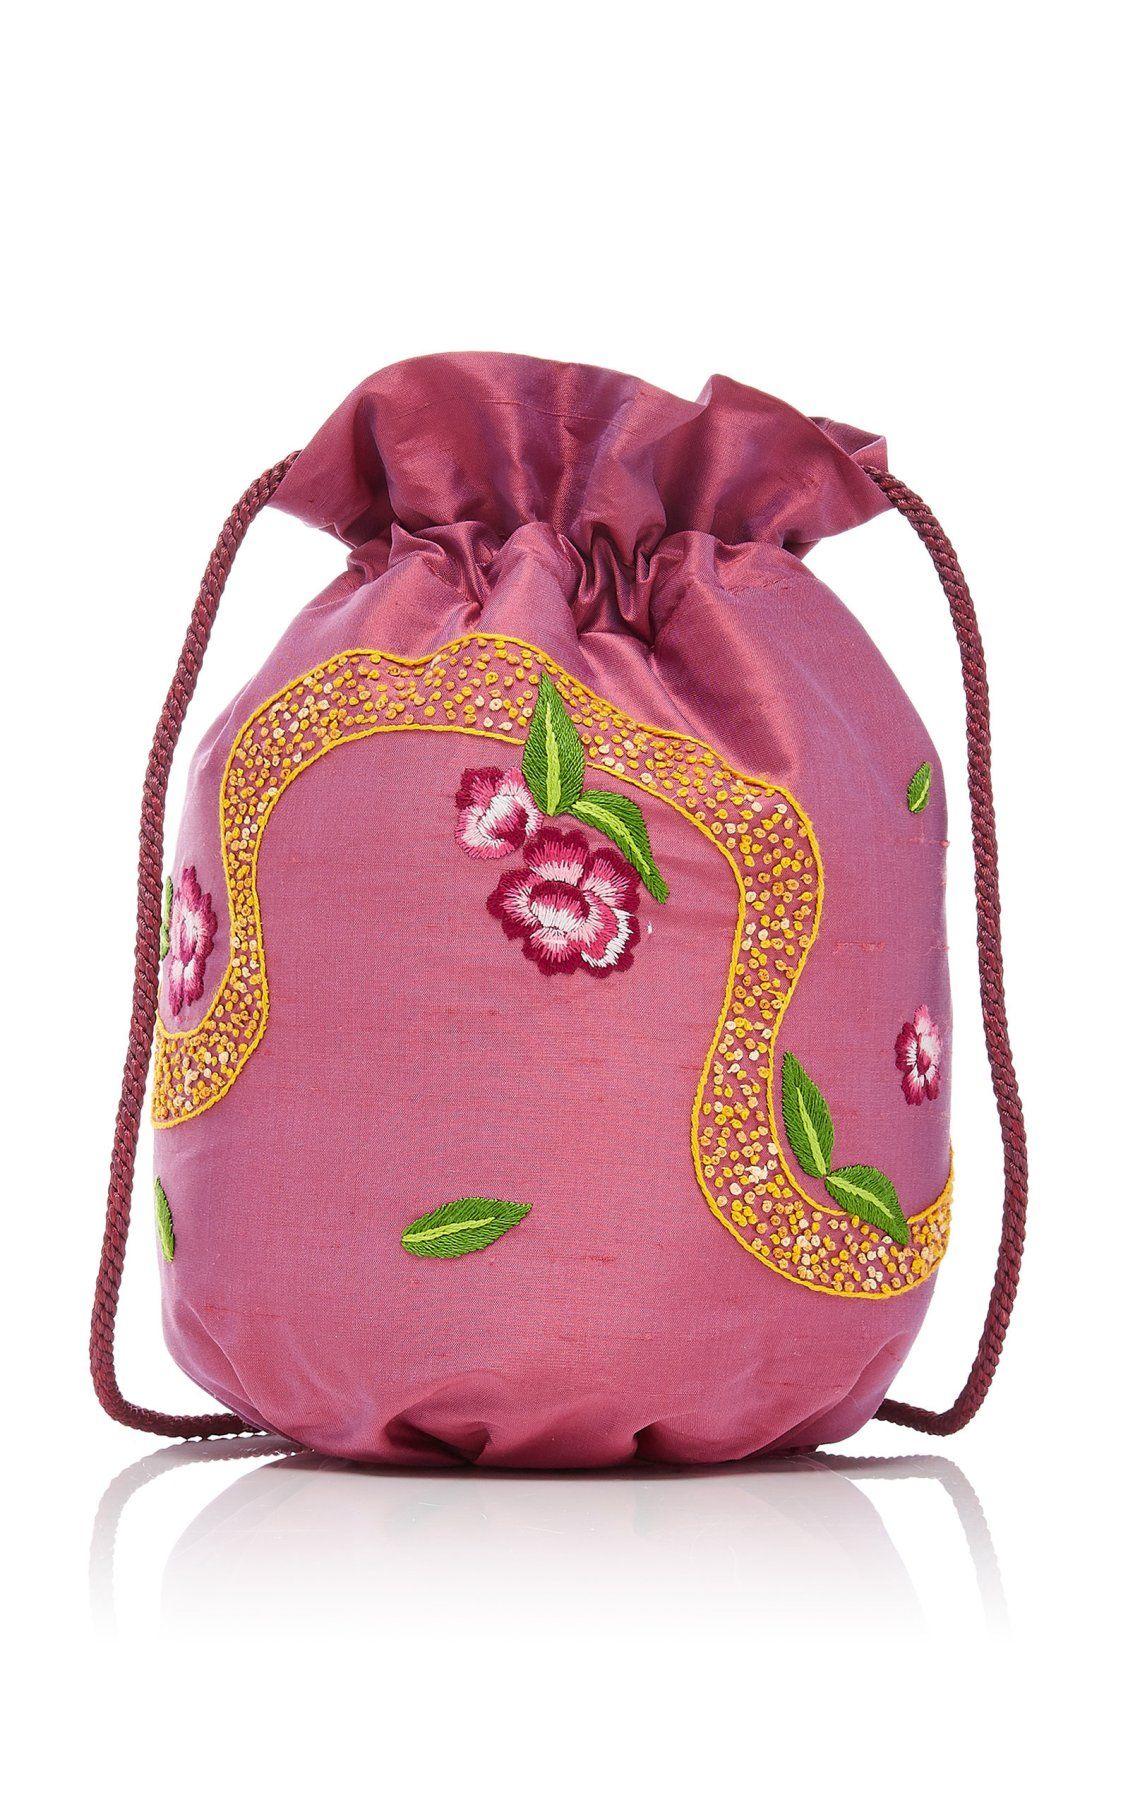 d734b632edad Potion No.4 Bag by Di Pasquale Guthmann PF19   Accessories   Bags ...